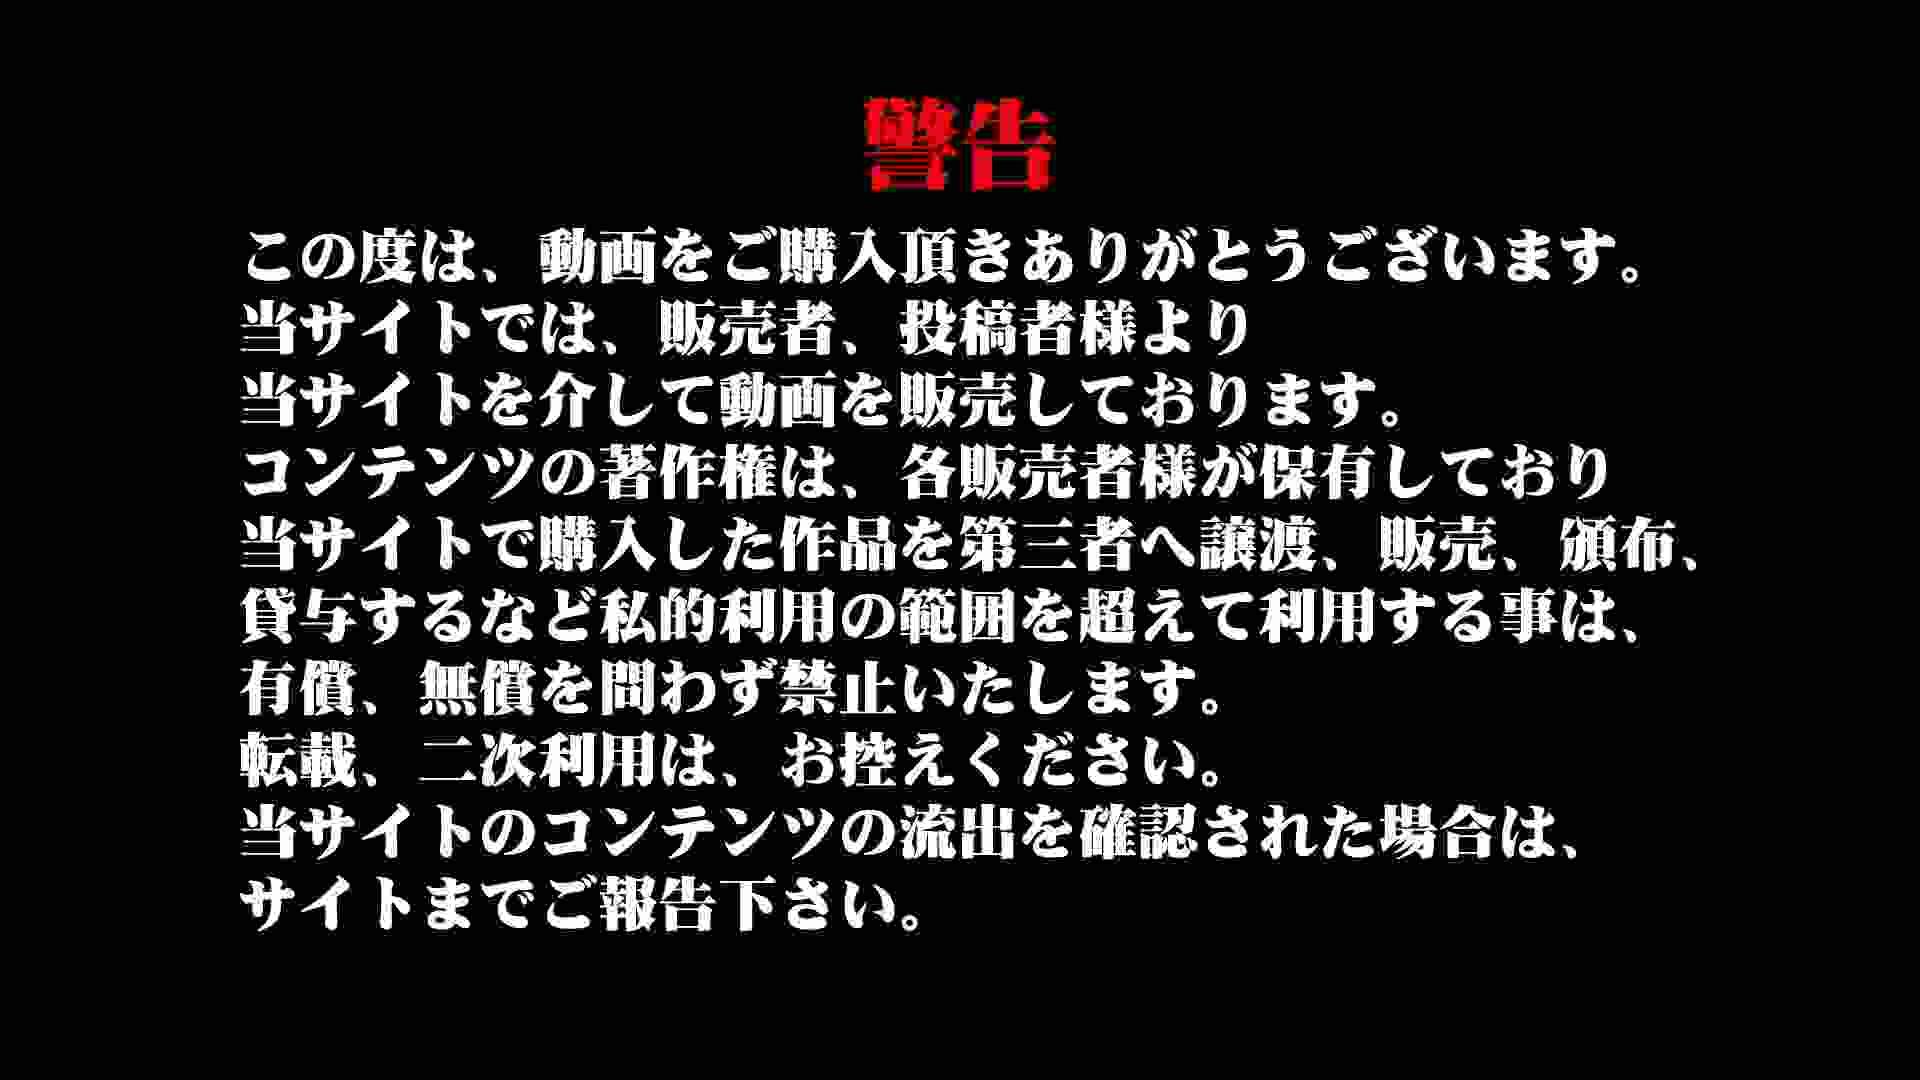 Aquaな露天風呂Vol.902 盗撮  66連発 3